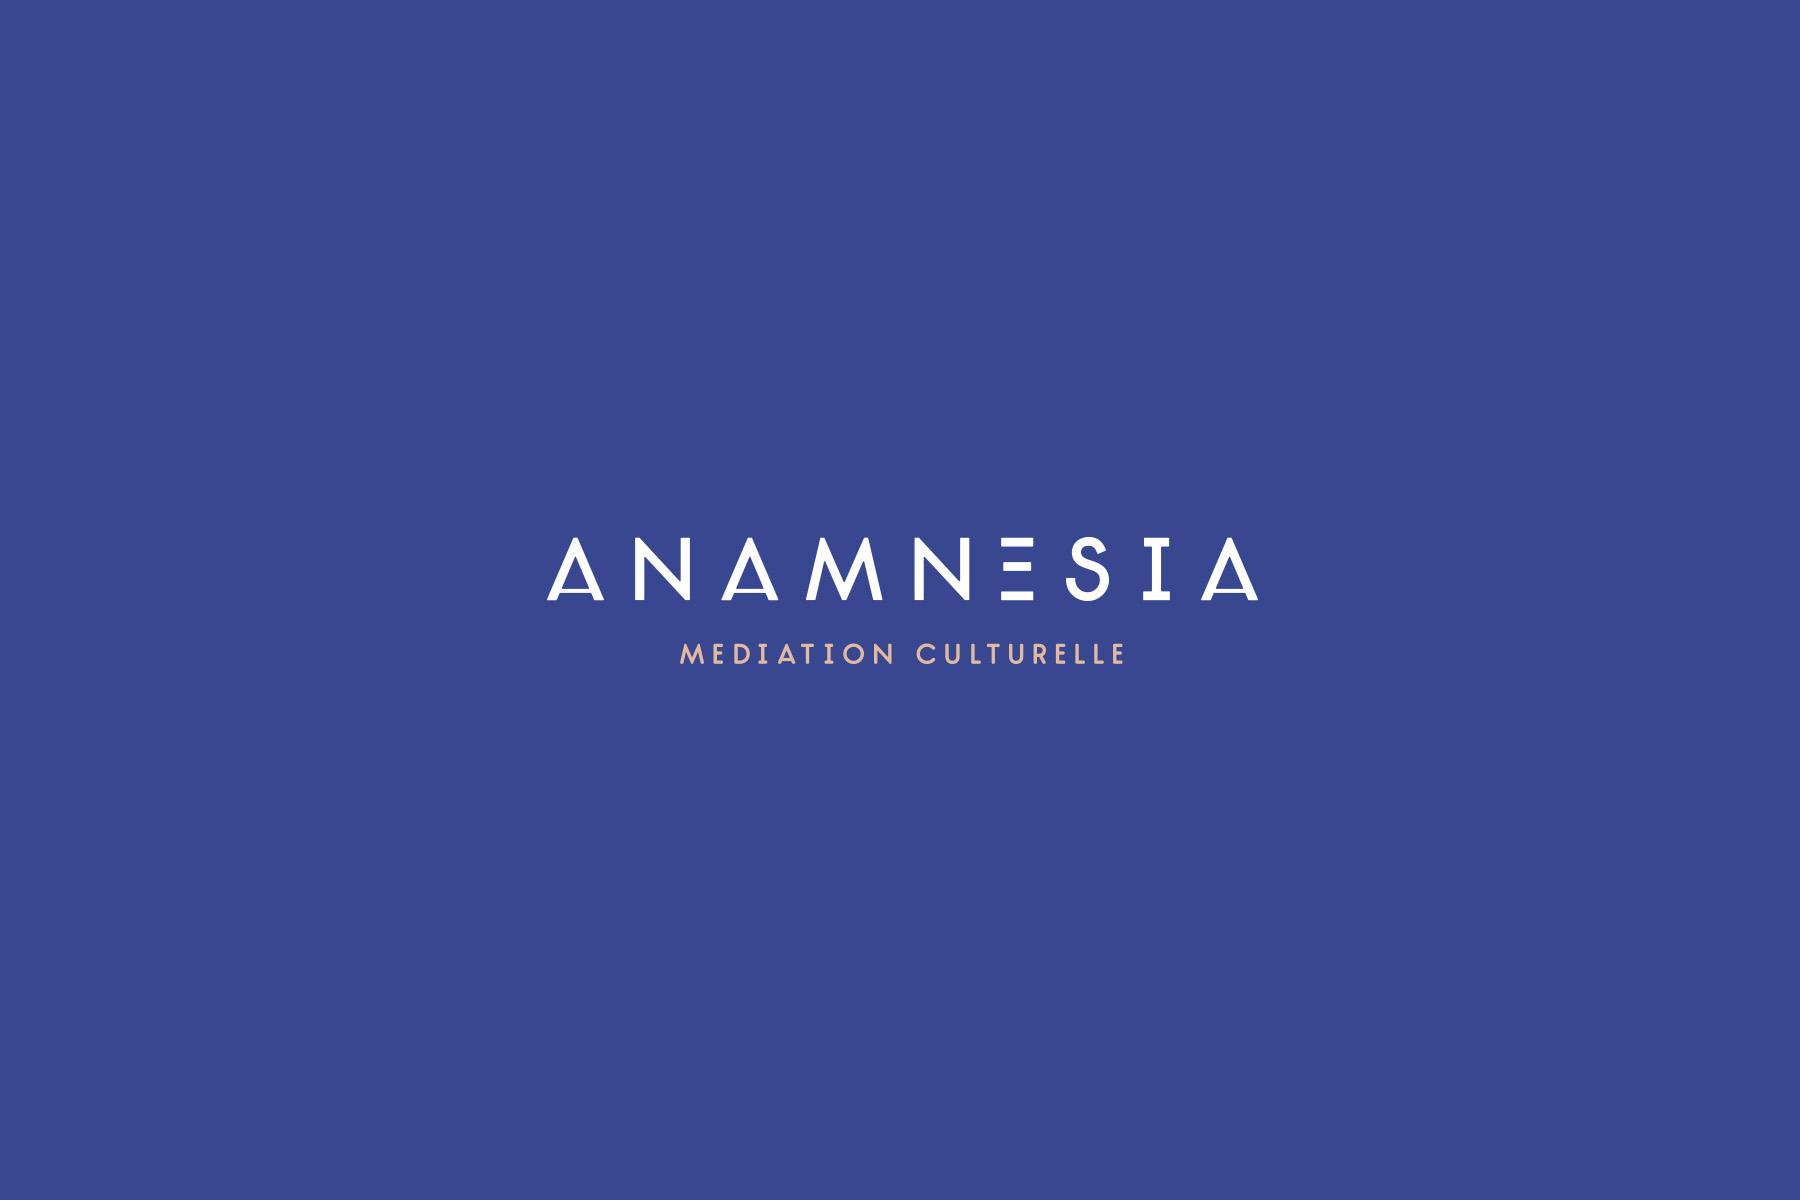 anamnesia_noemiecedille03